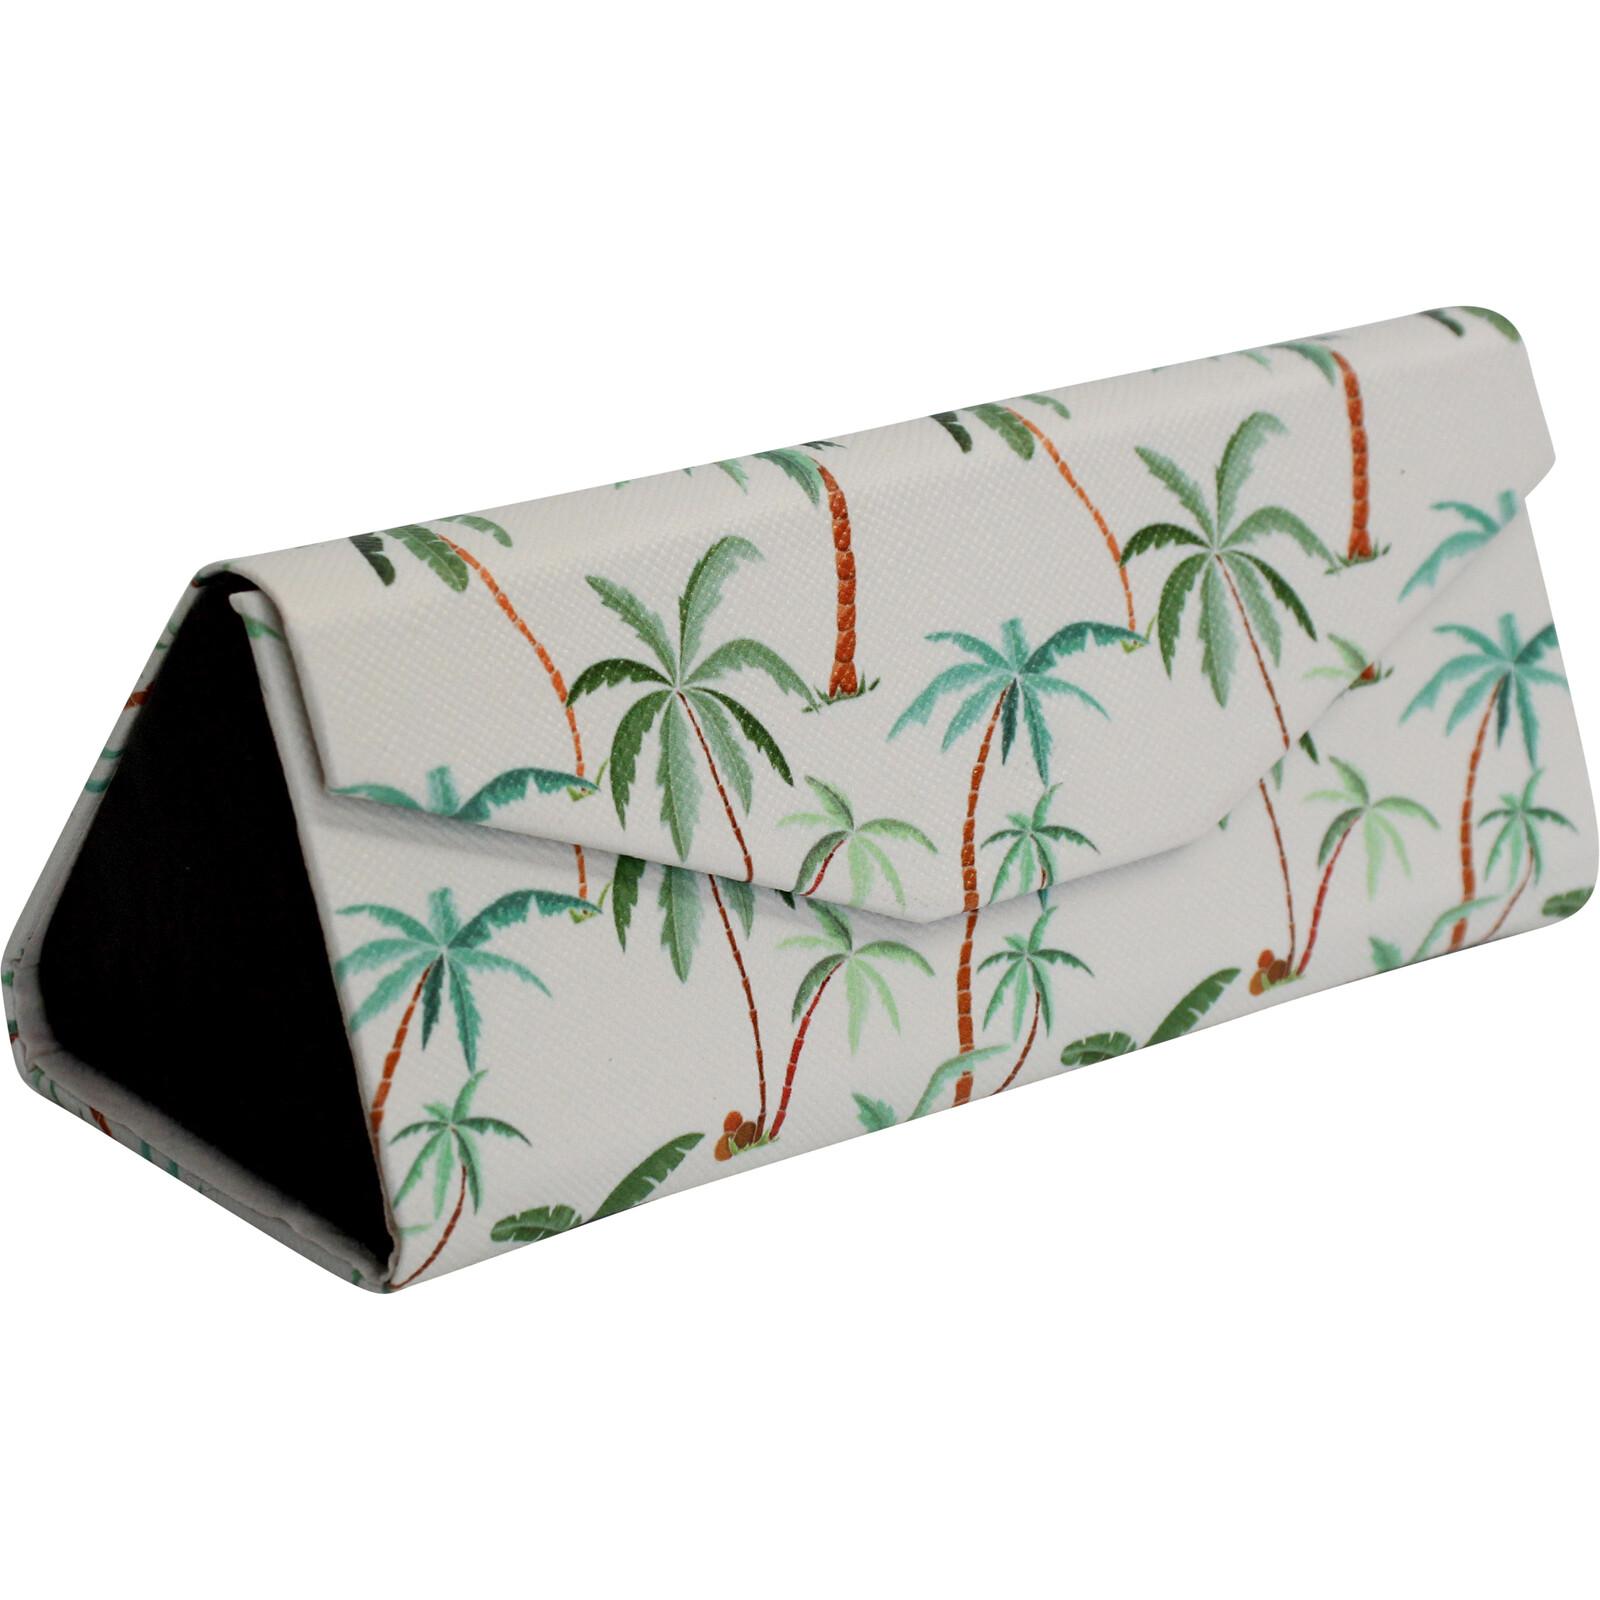 Glasses Case Green Palms